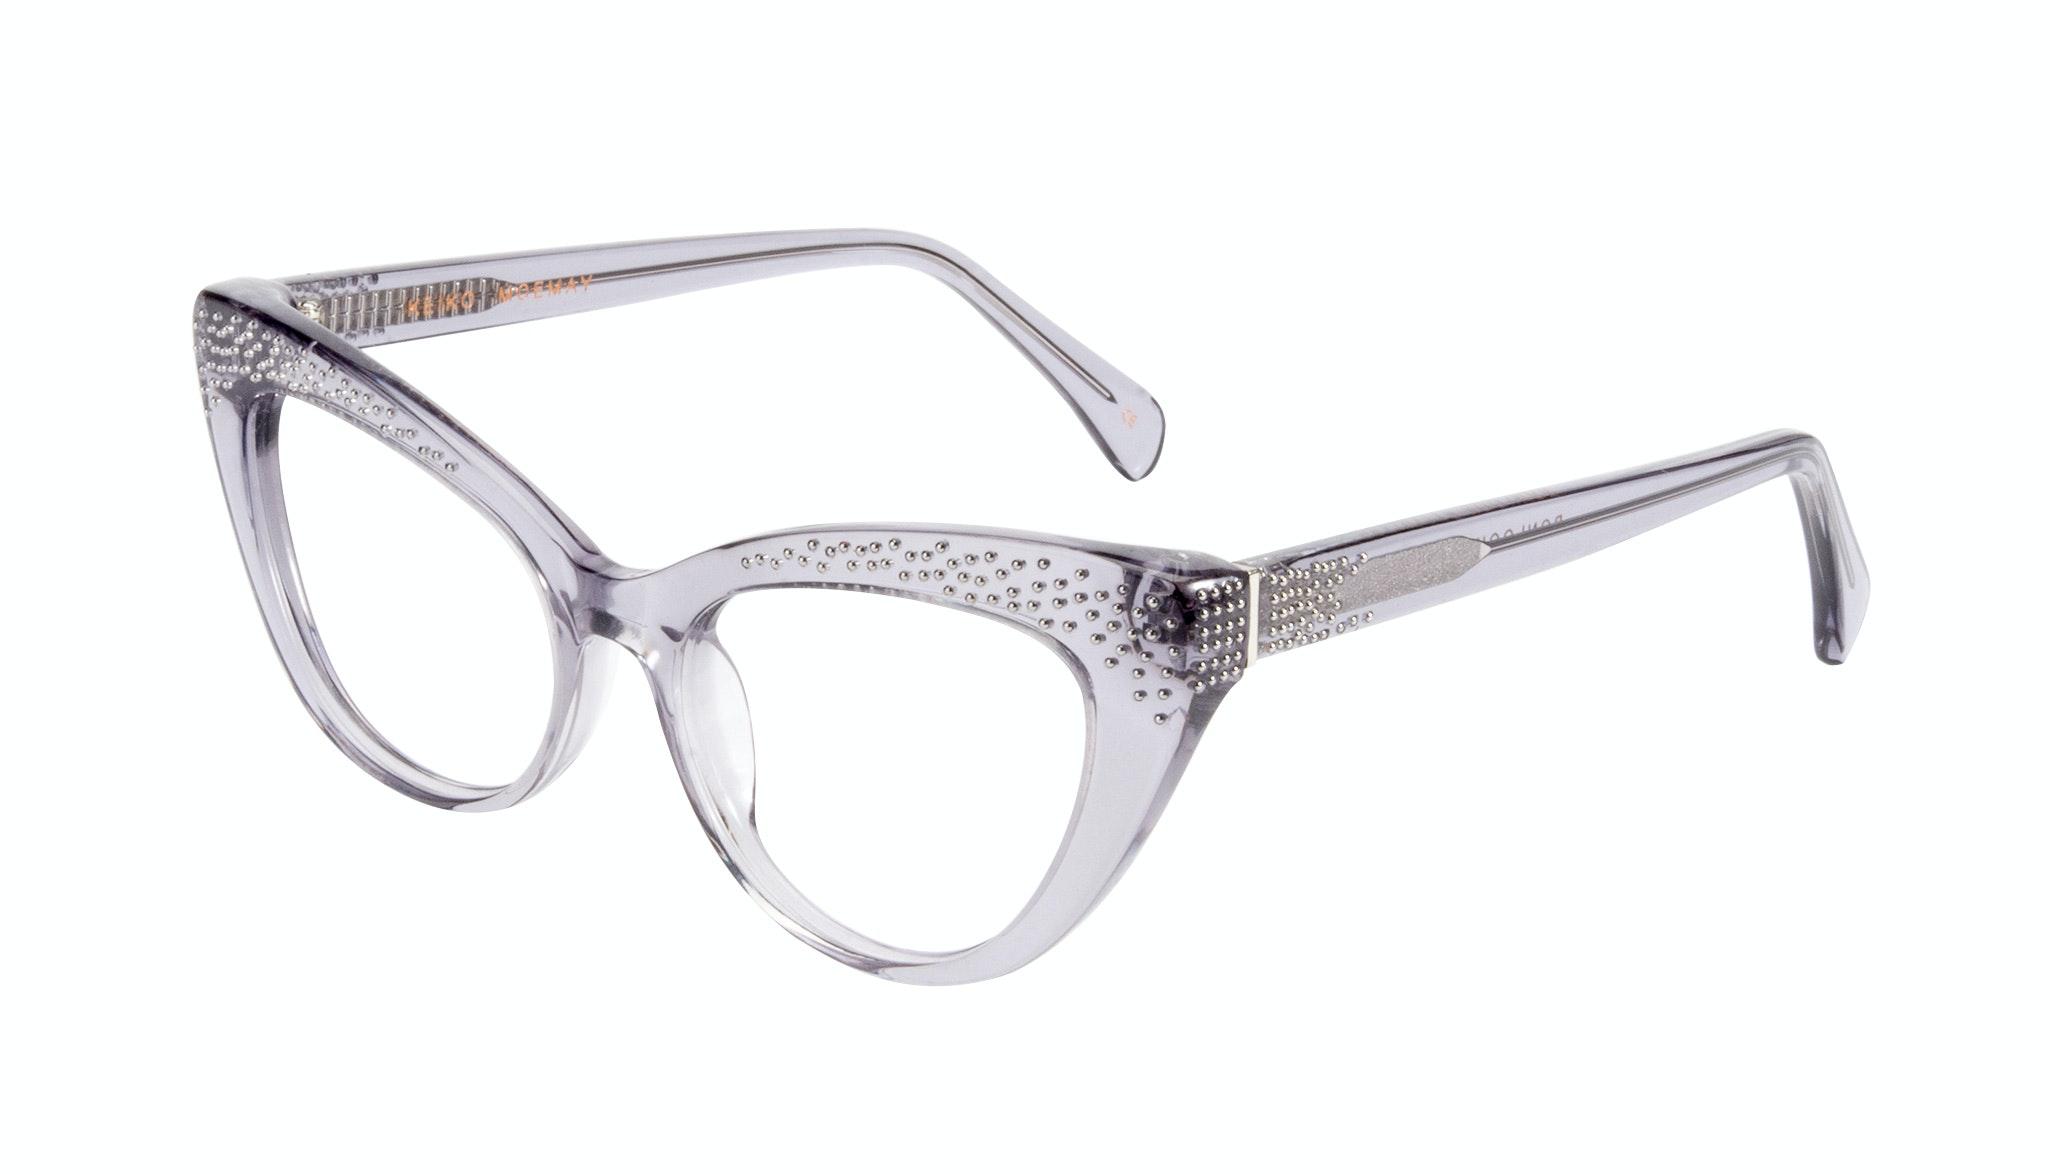 Affordable Fashion Glasses Cat Eye Eyeglasses Women Keiko Moe May Tilt